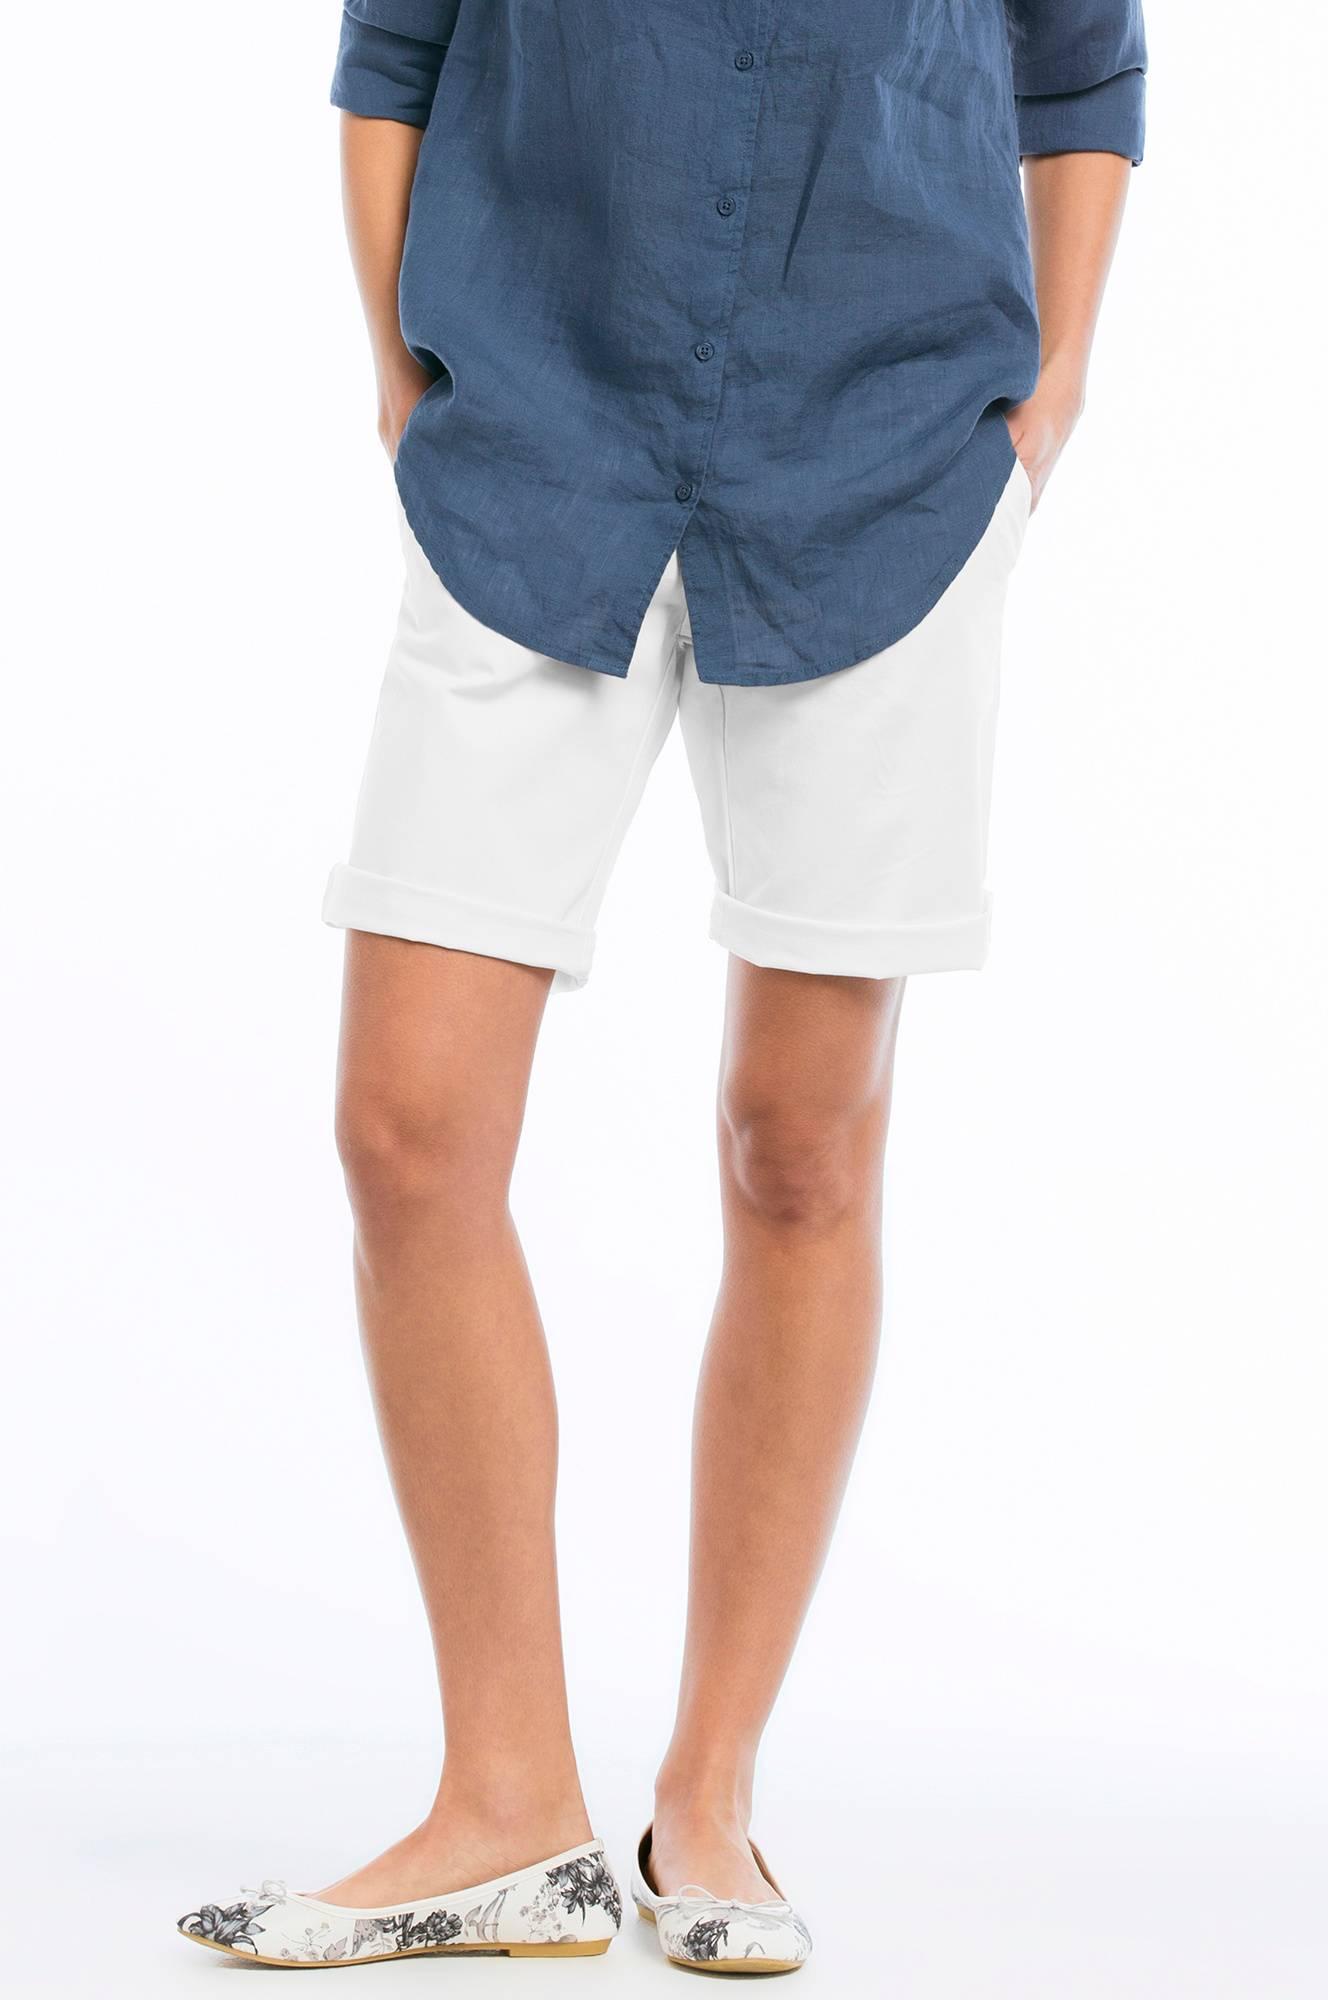 071d0b5c Ellos Collection Shorts i stretchtwill - Hvit - Dame - Ellos.no